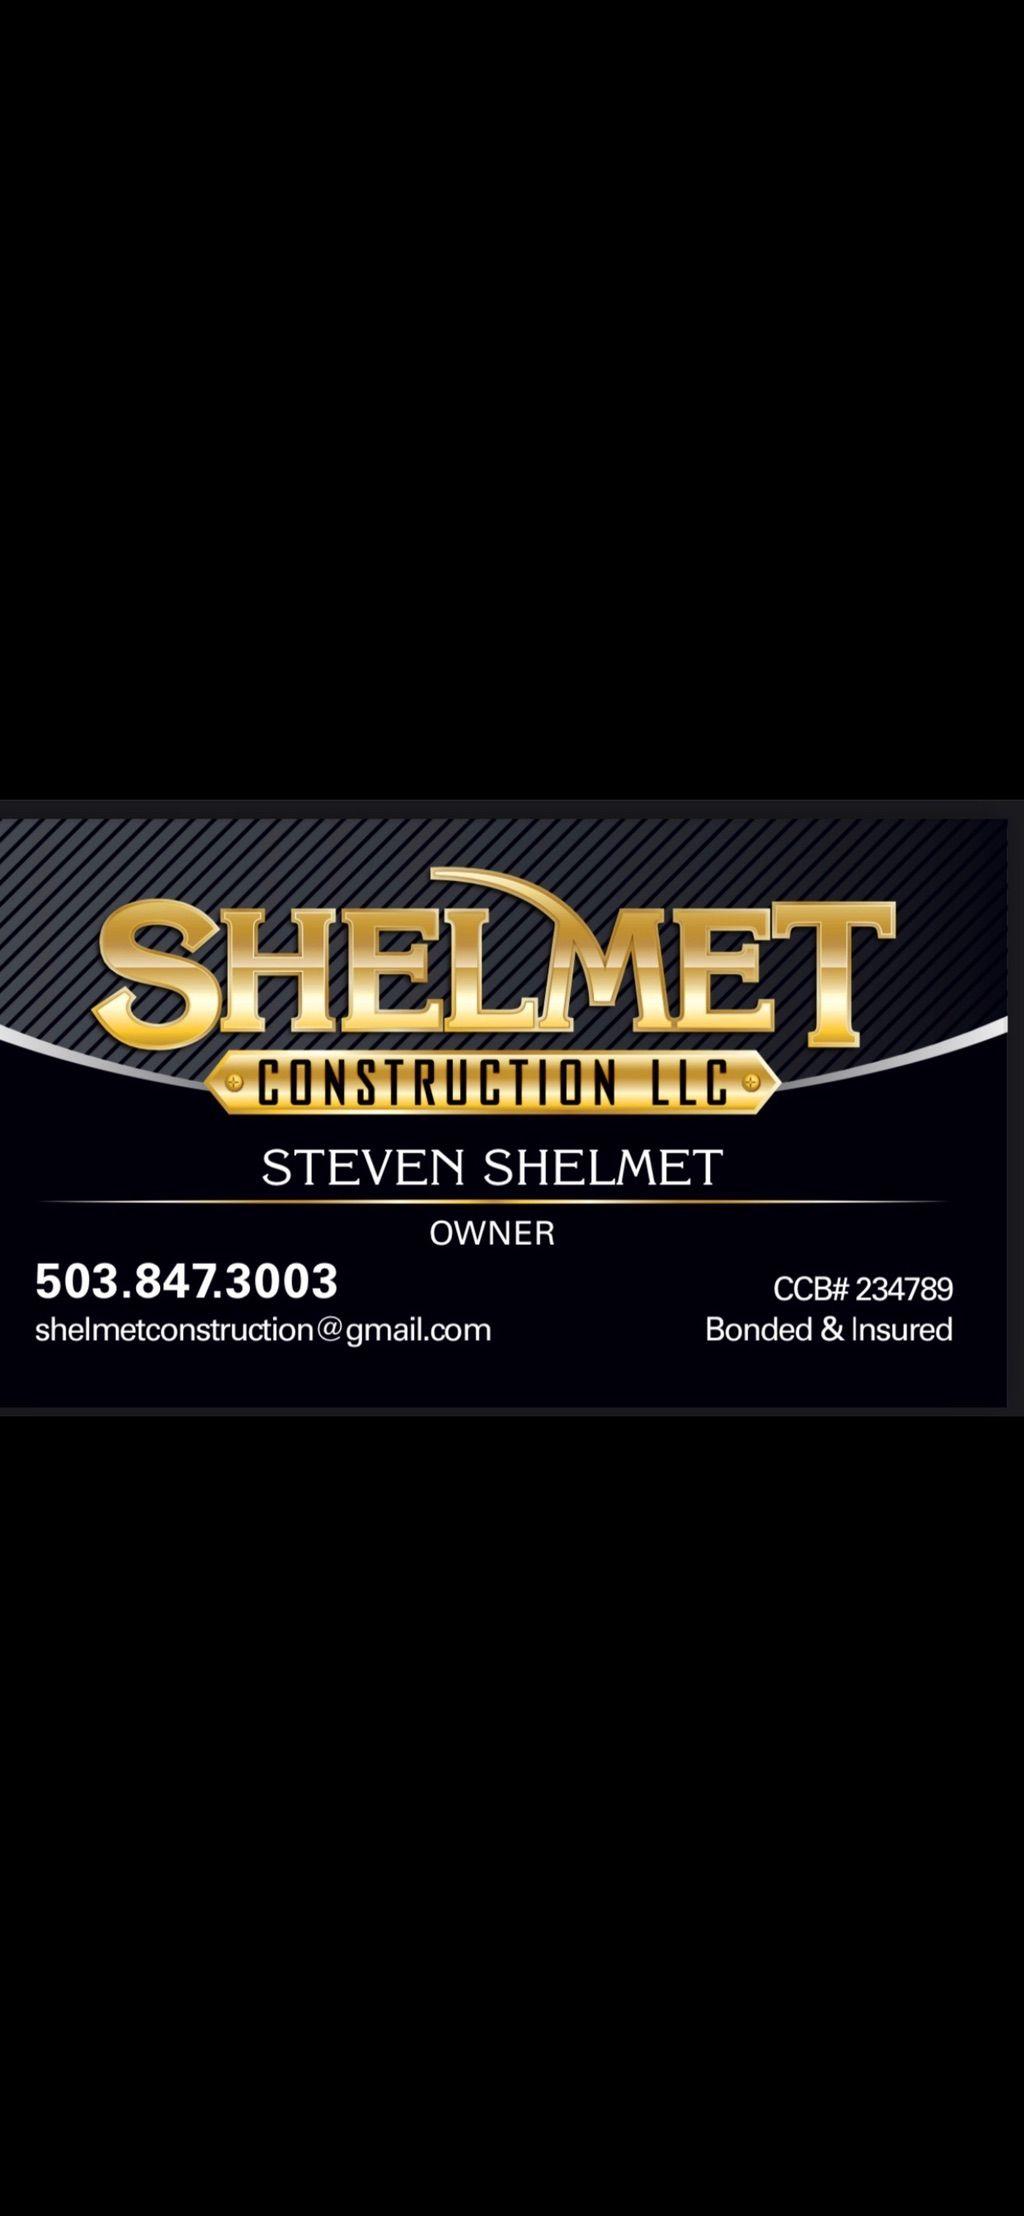 Shelmet Construction